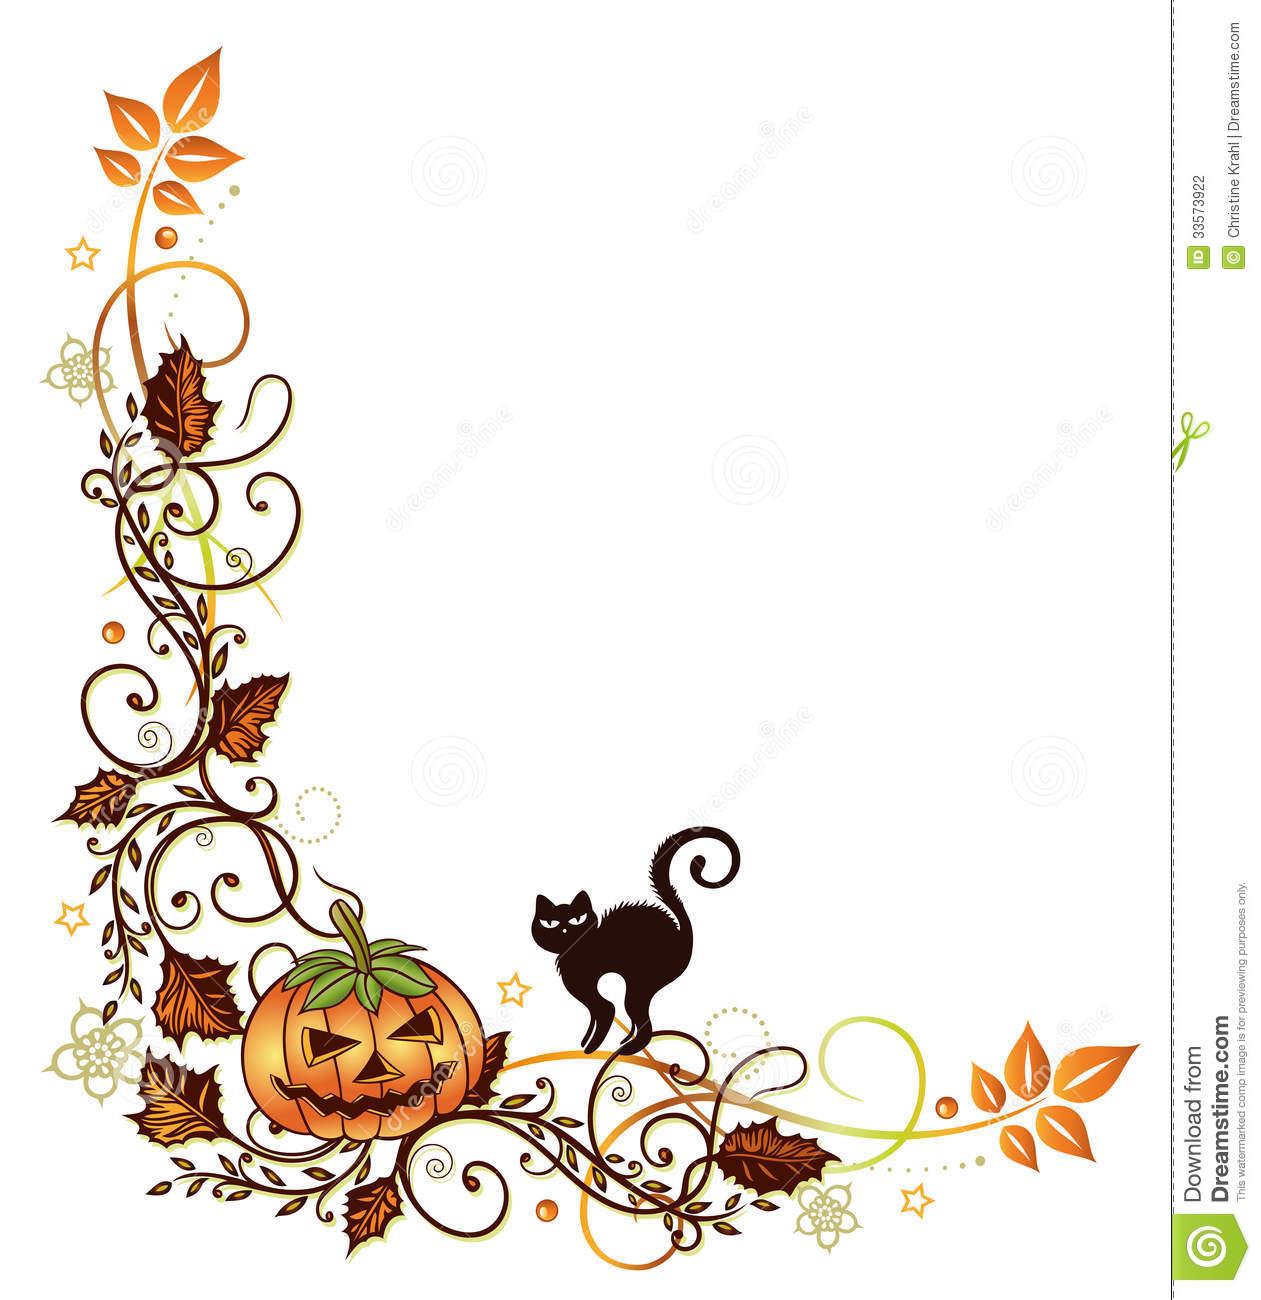 Halloween clip art borders svg royalty free stock Halloween Border Clipart | Clipart Panda - Free Clipart Images svg royalty free stock